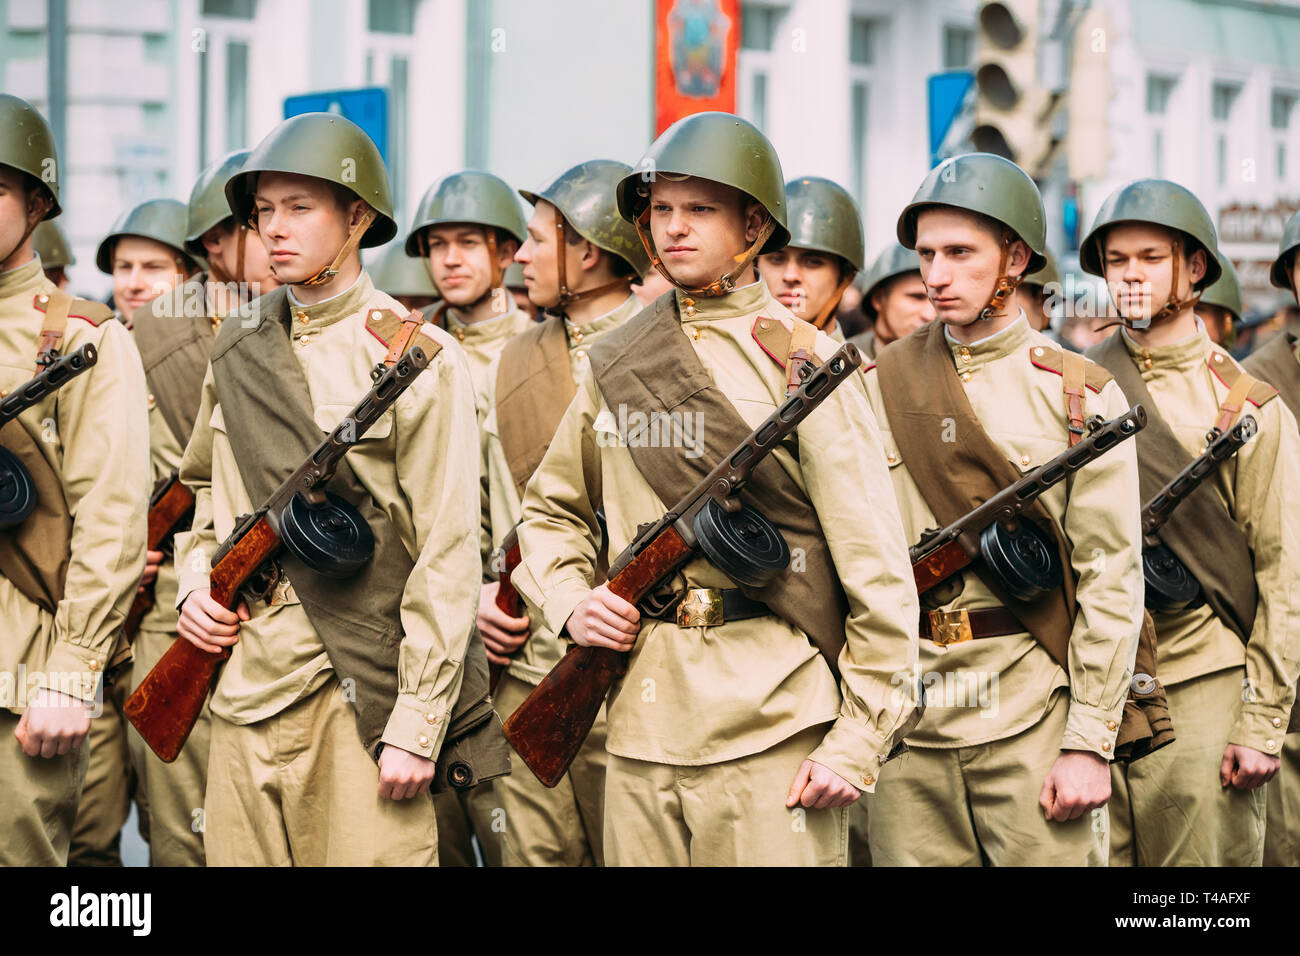 Afx Army Cadets soviet military helmet stock photos & soviet military helmet